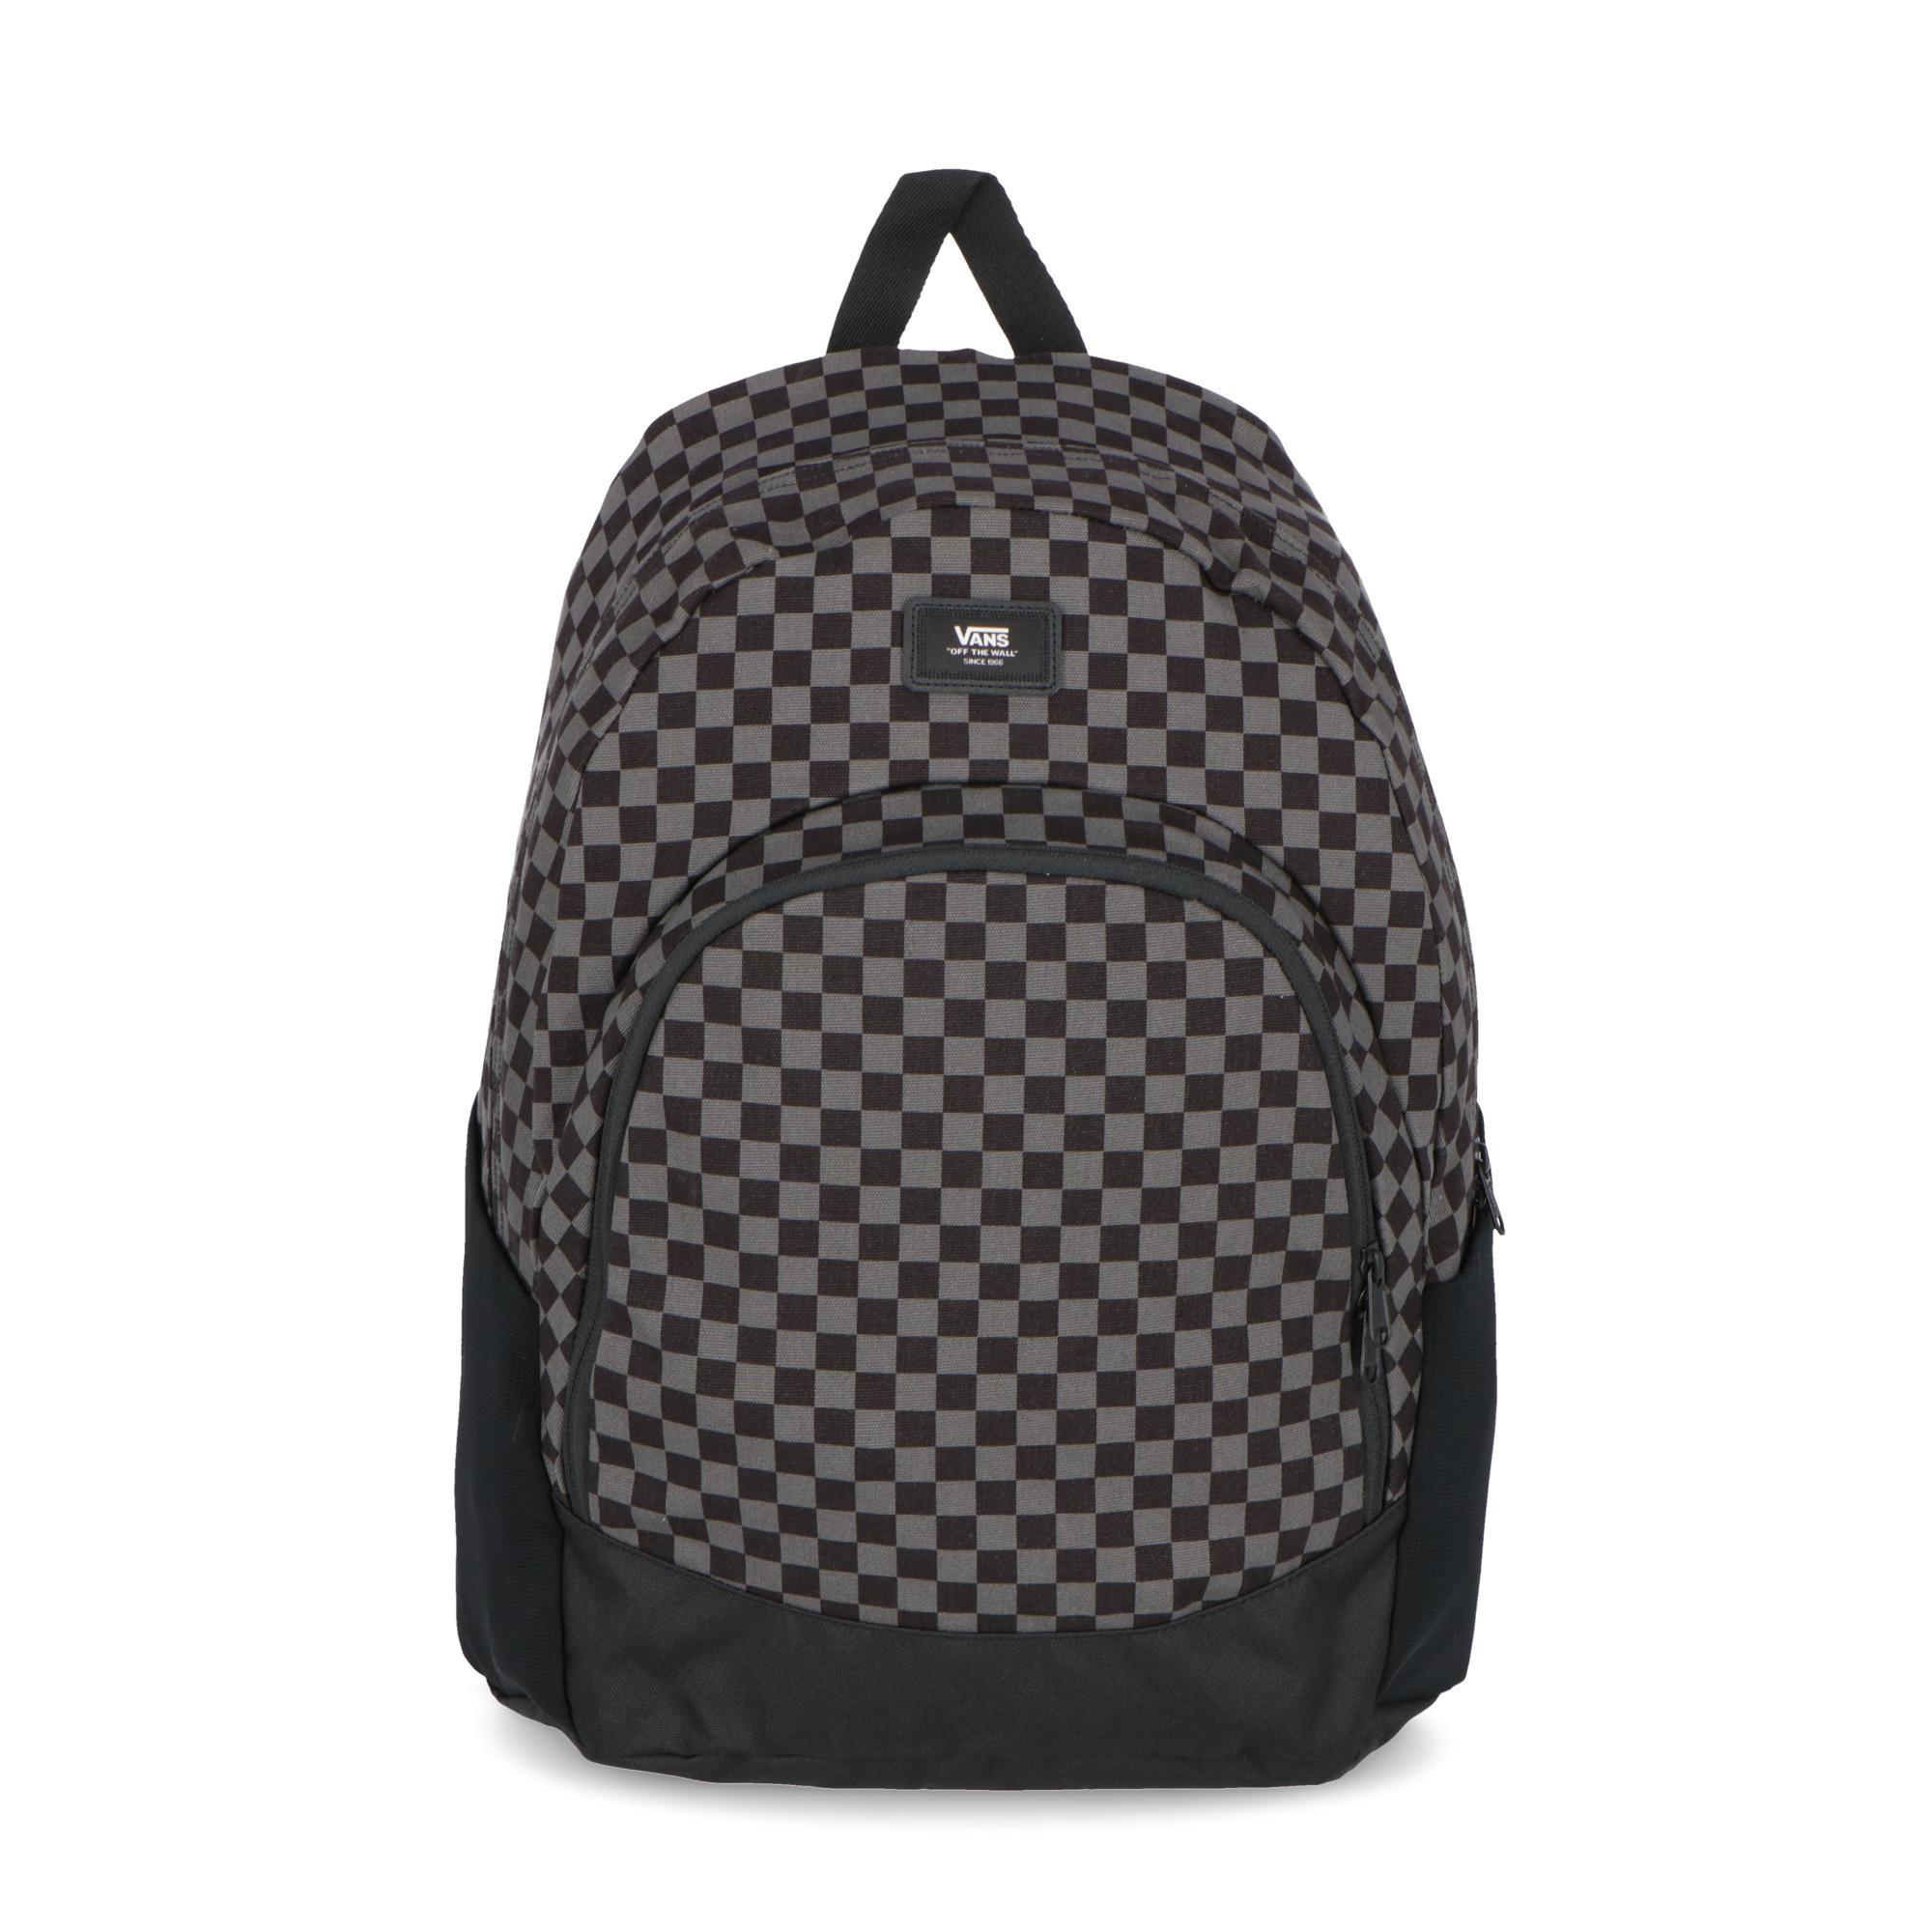 3d7456a992 Vans Van Doren Original Backpack Black Charco